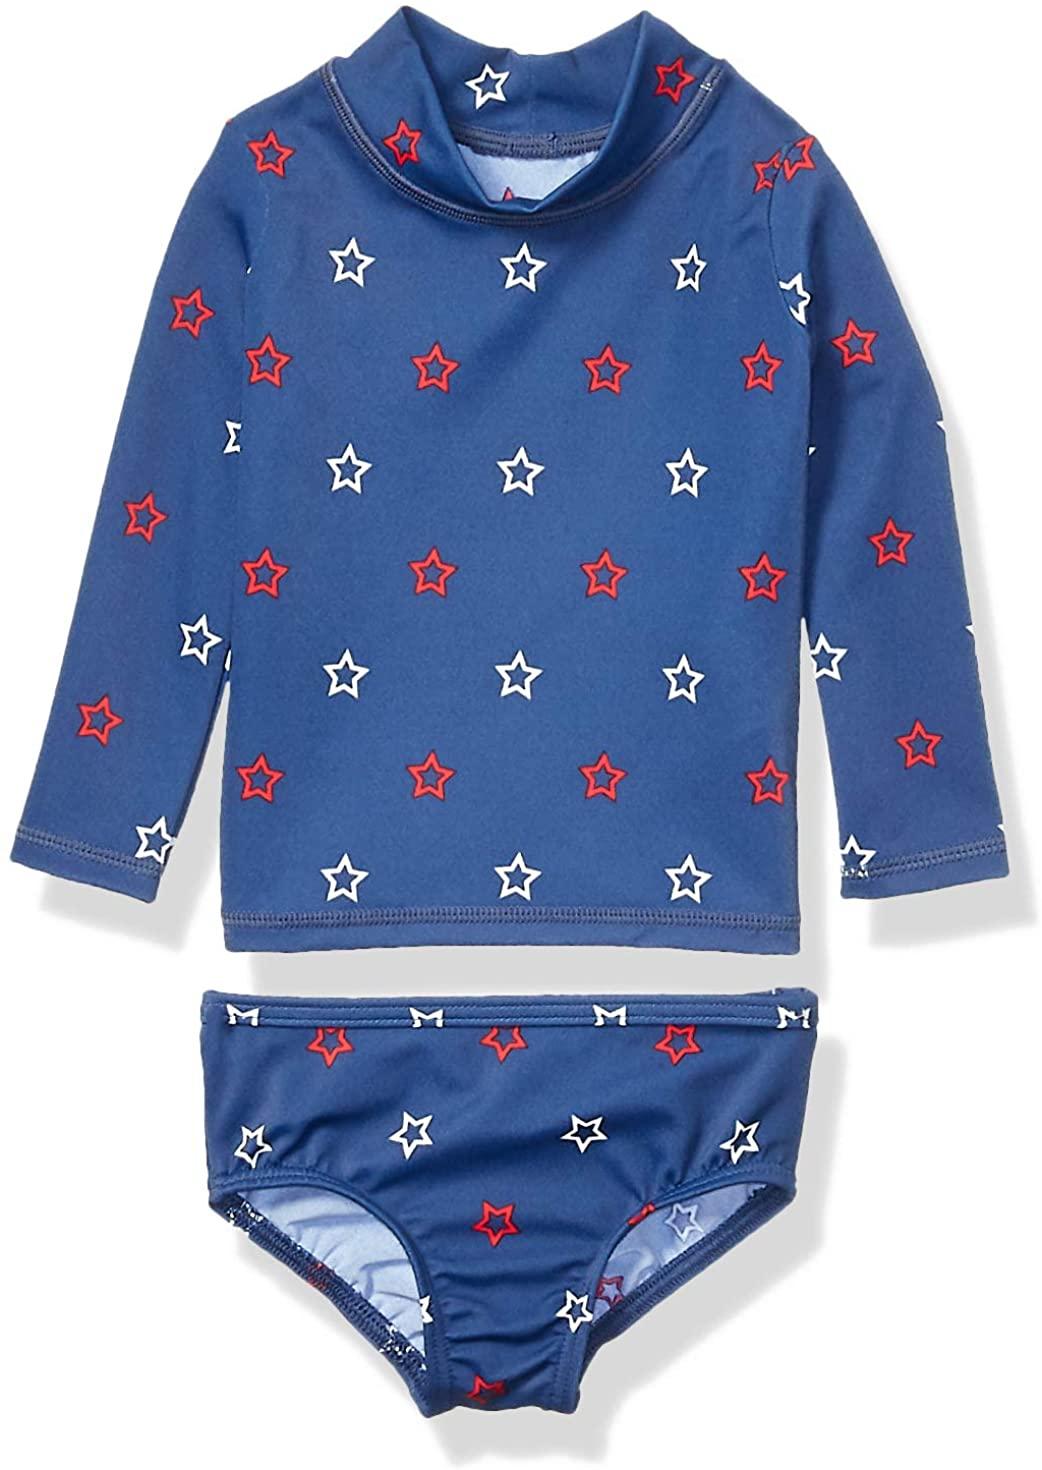 DHgate Essentials UPF 50+ Baby Girls 2-Piece Long-Sleeve Rash Guard Set